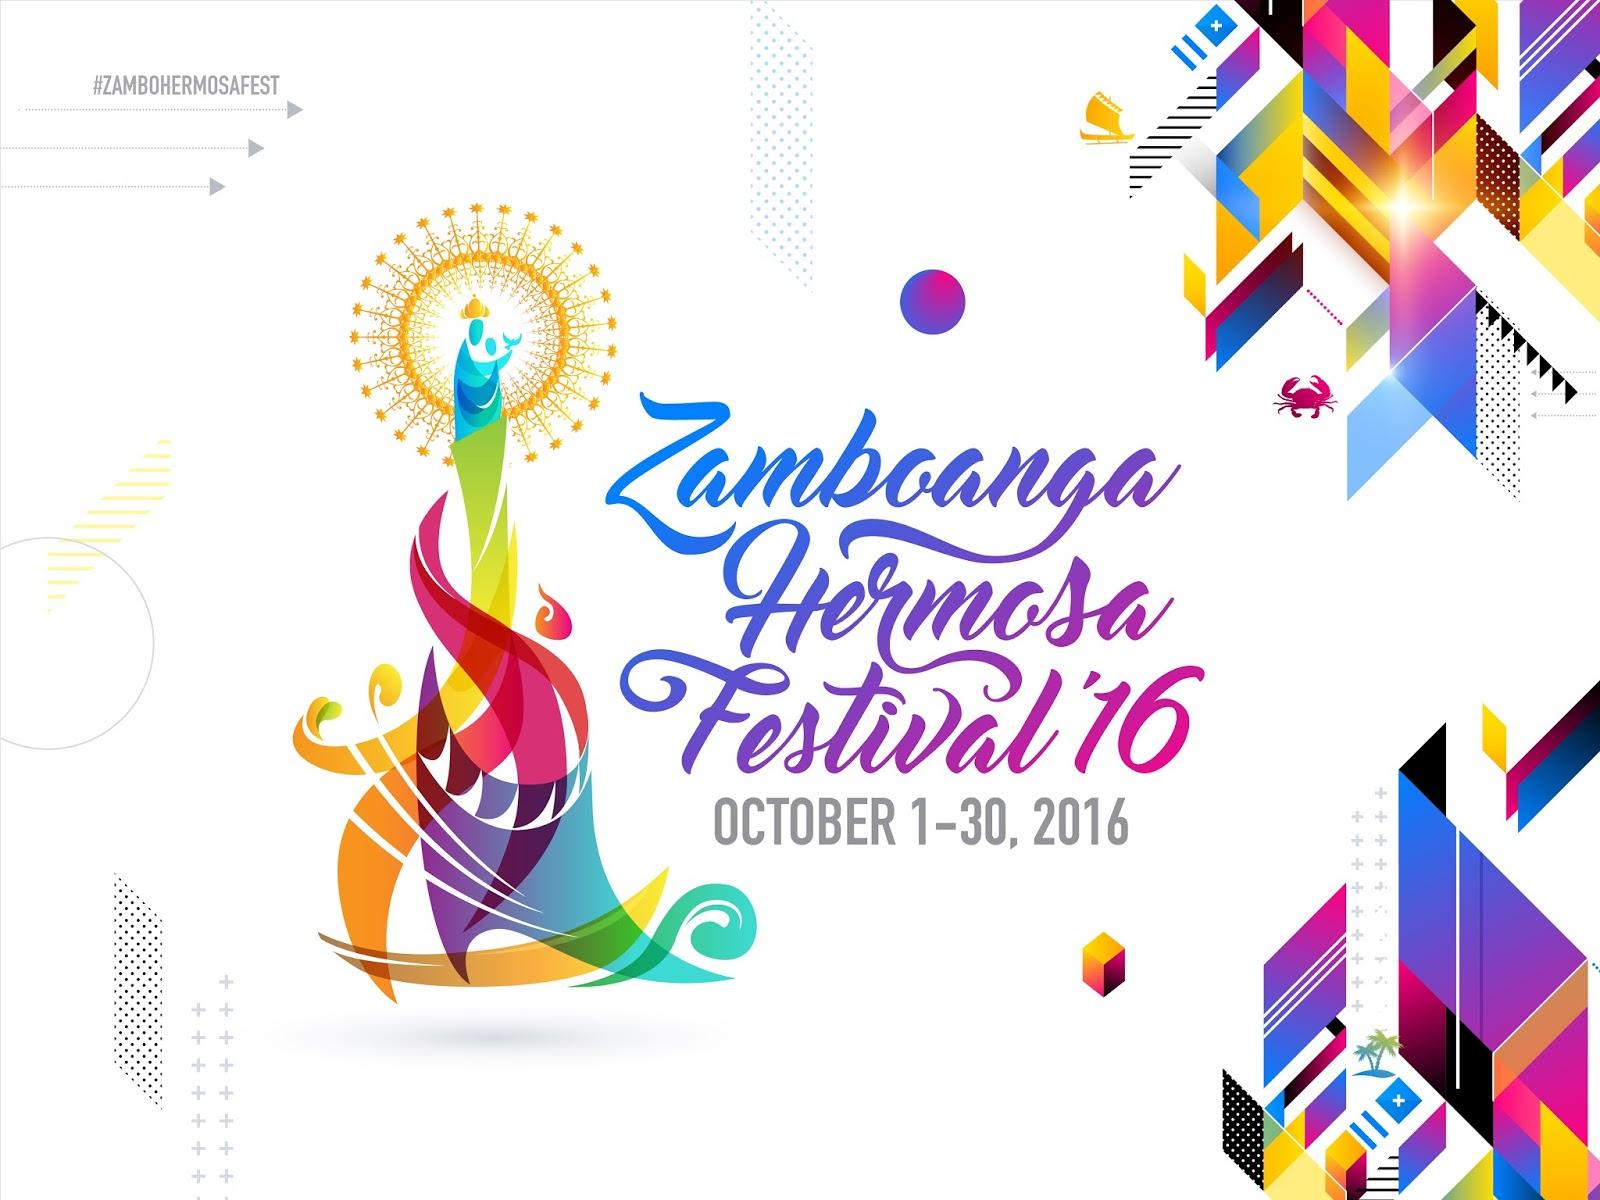 Hindu Decorations For Home Zamboanga Hermosa Festival Logo Csz97 Blog Folio